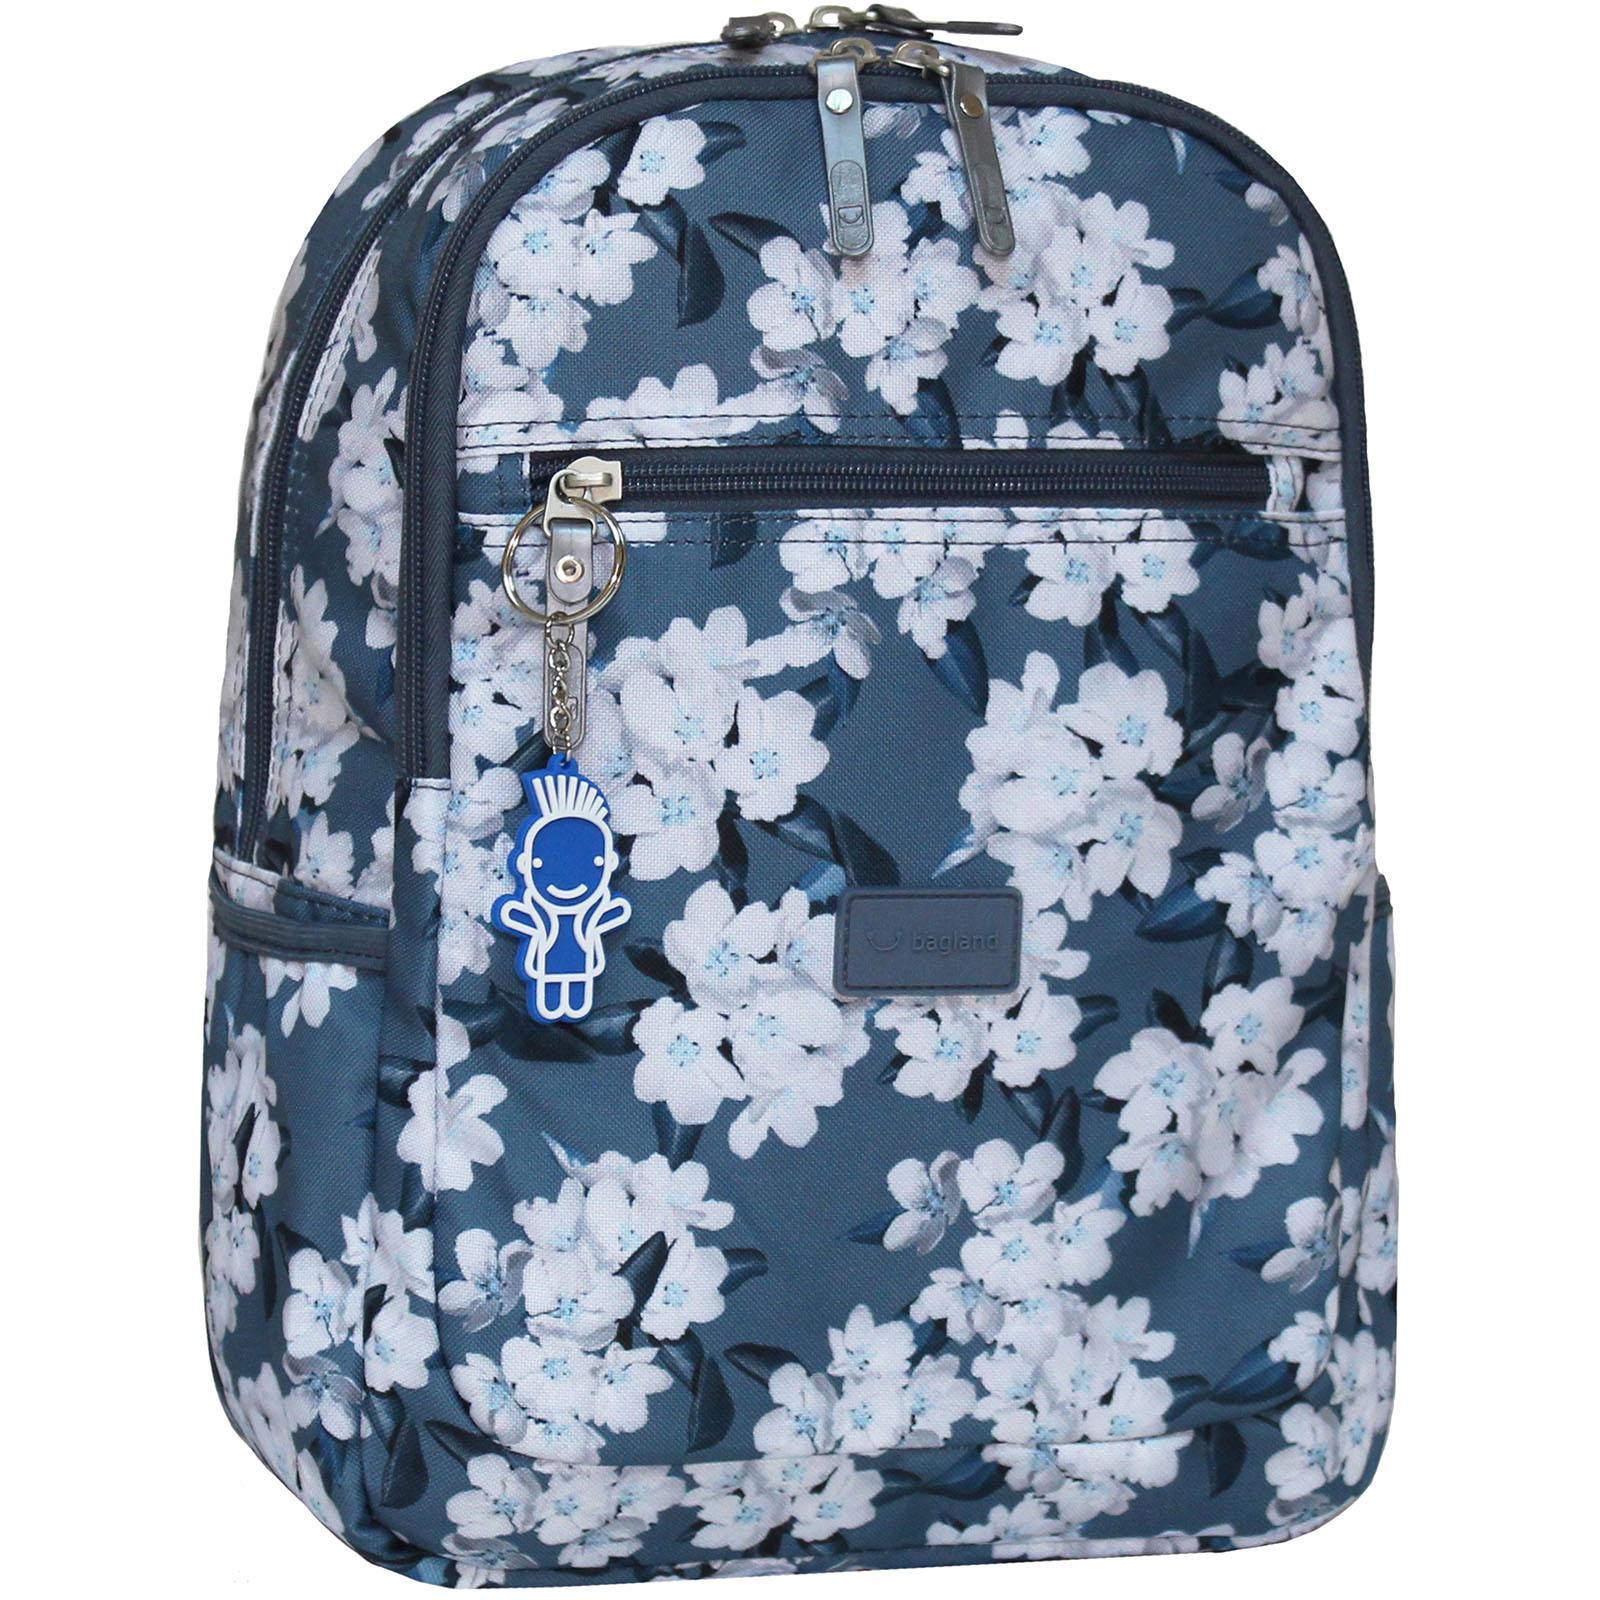 Детские рюкзаки Рюкзак Bagland Young 13 л. сублімація 161 (00510664) IMG_8639_арт.161_.JPG